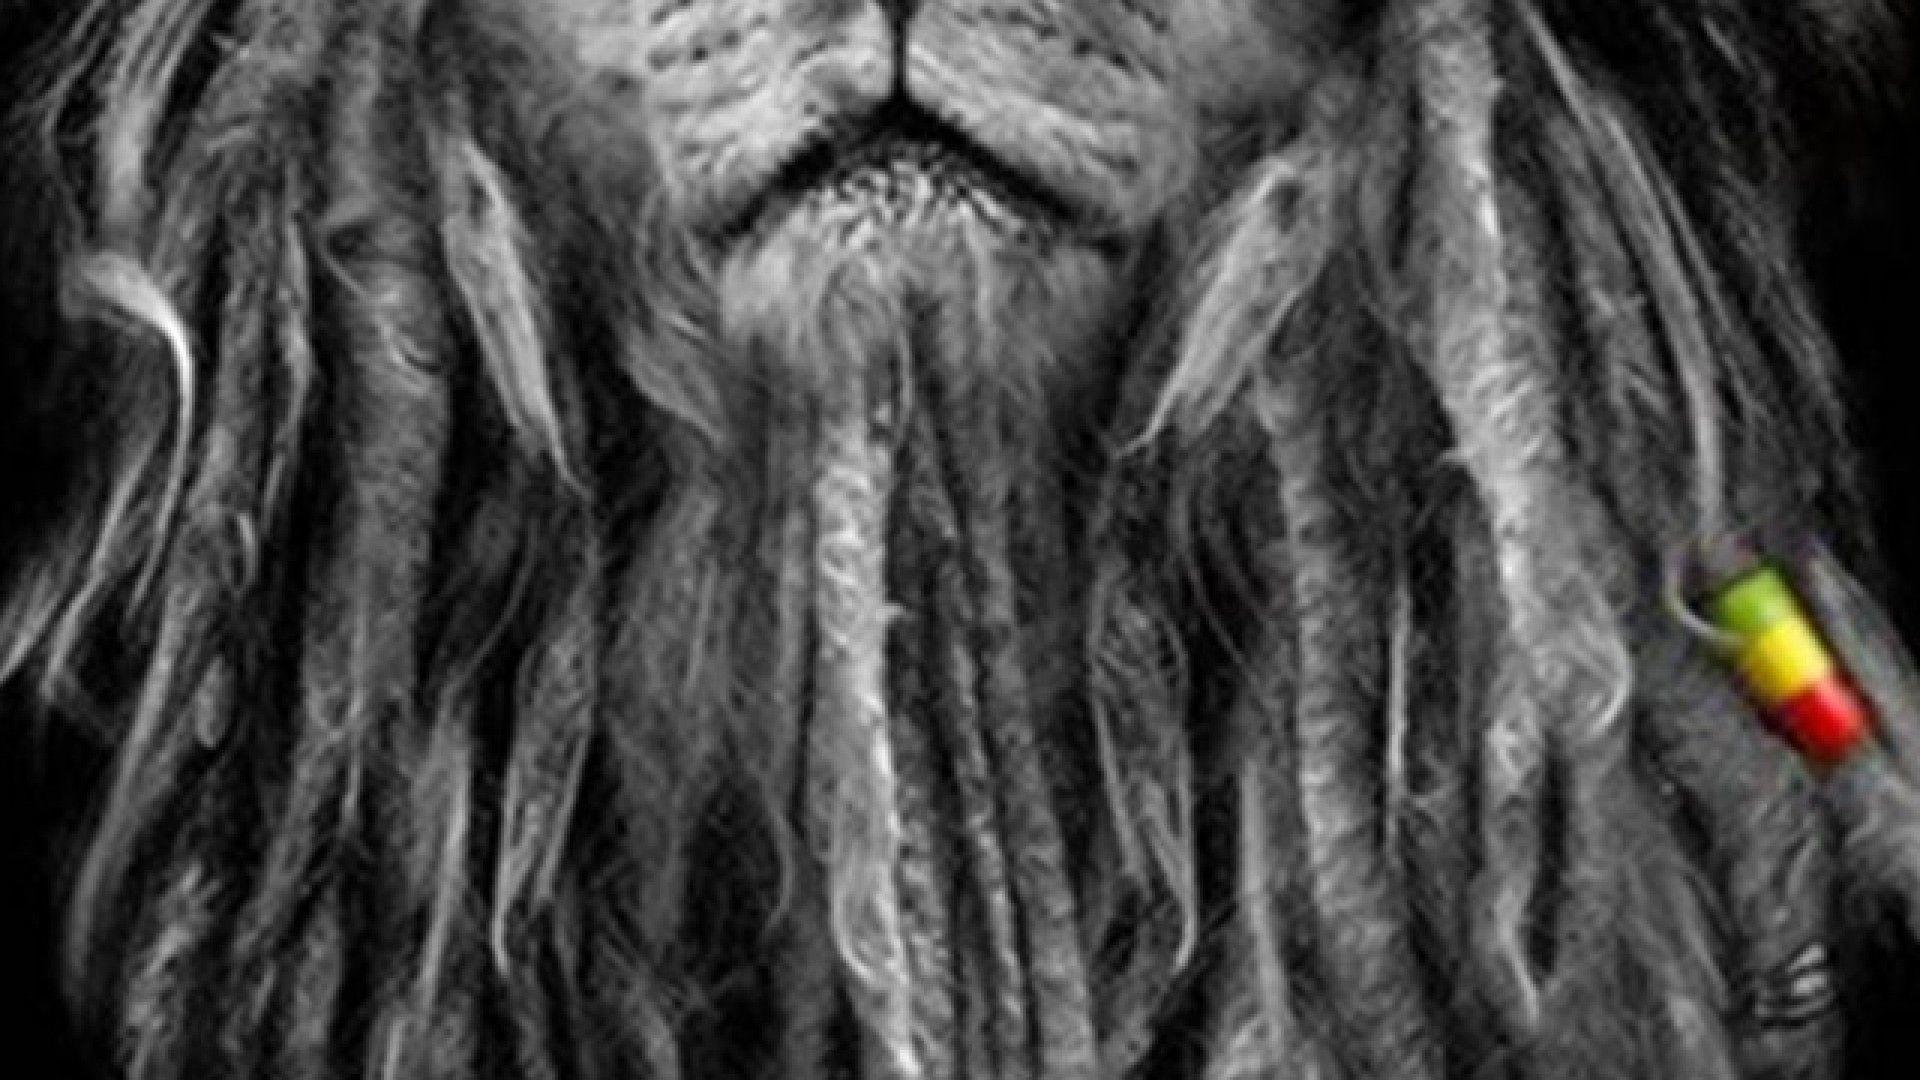 My Top Collection: Rasta lion wallpaper Rasta Lion Wallpapers Wallpapers)